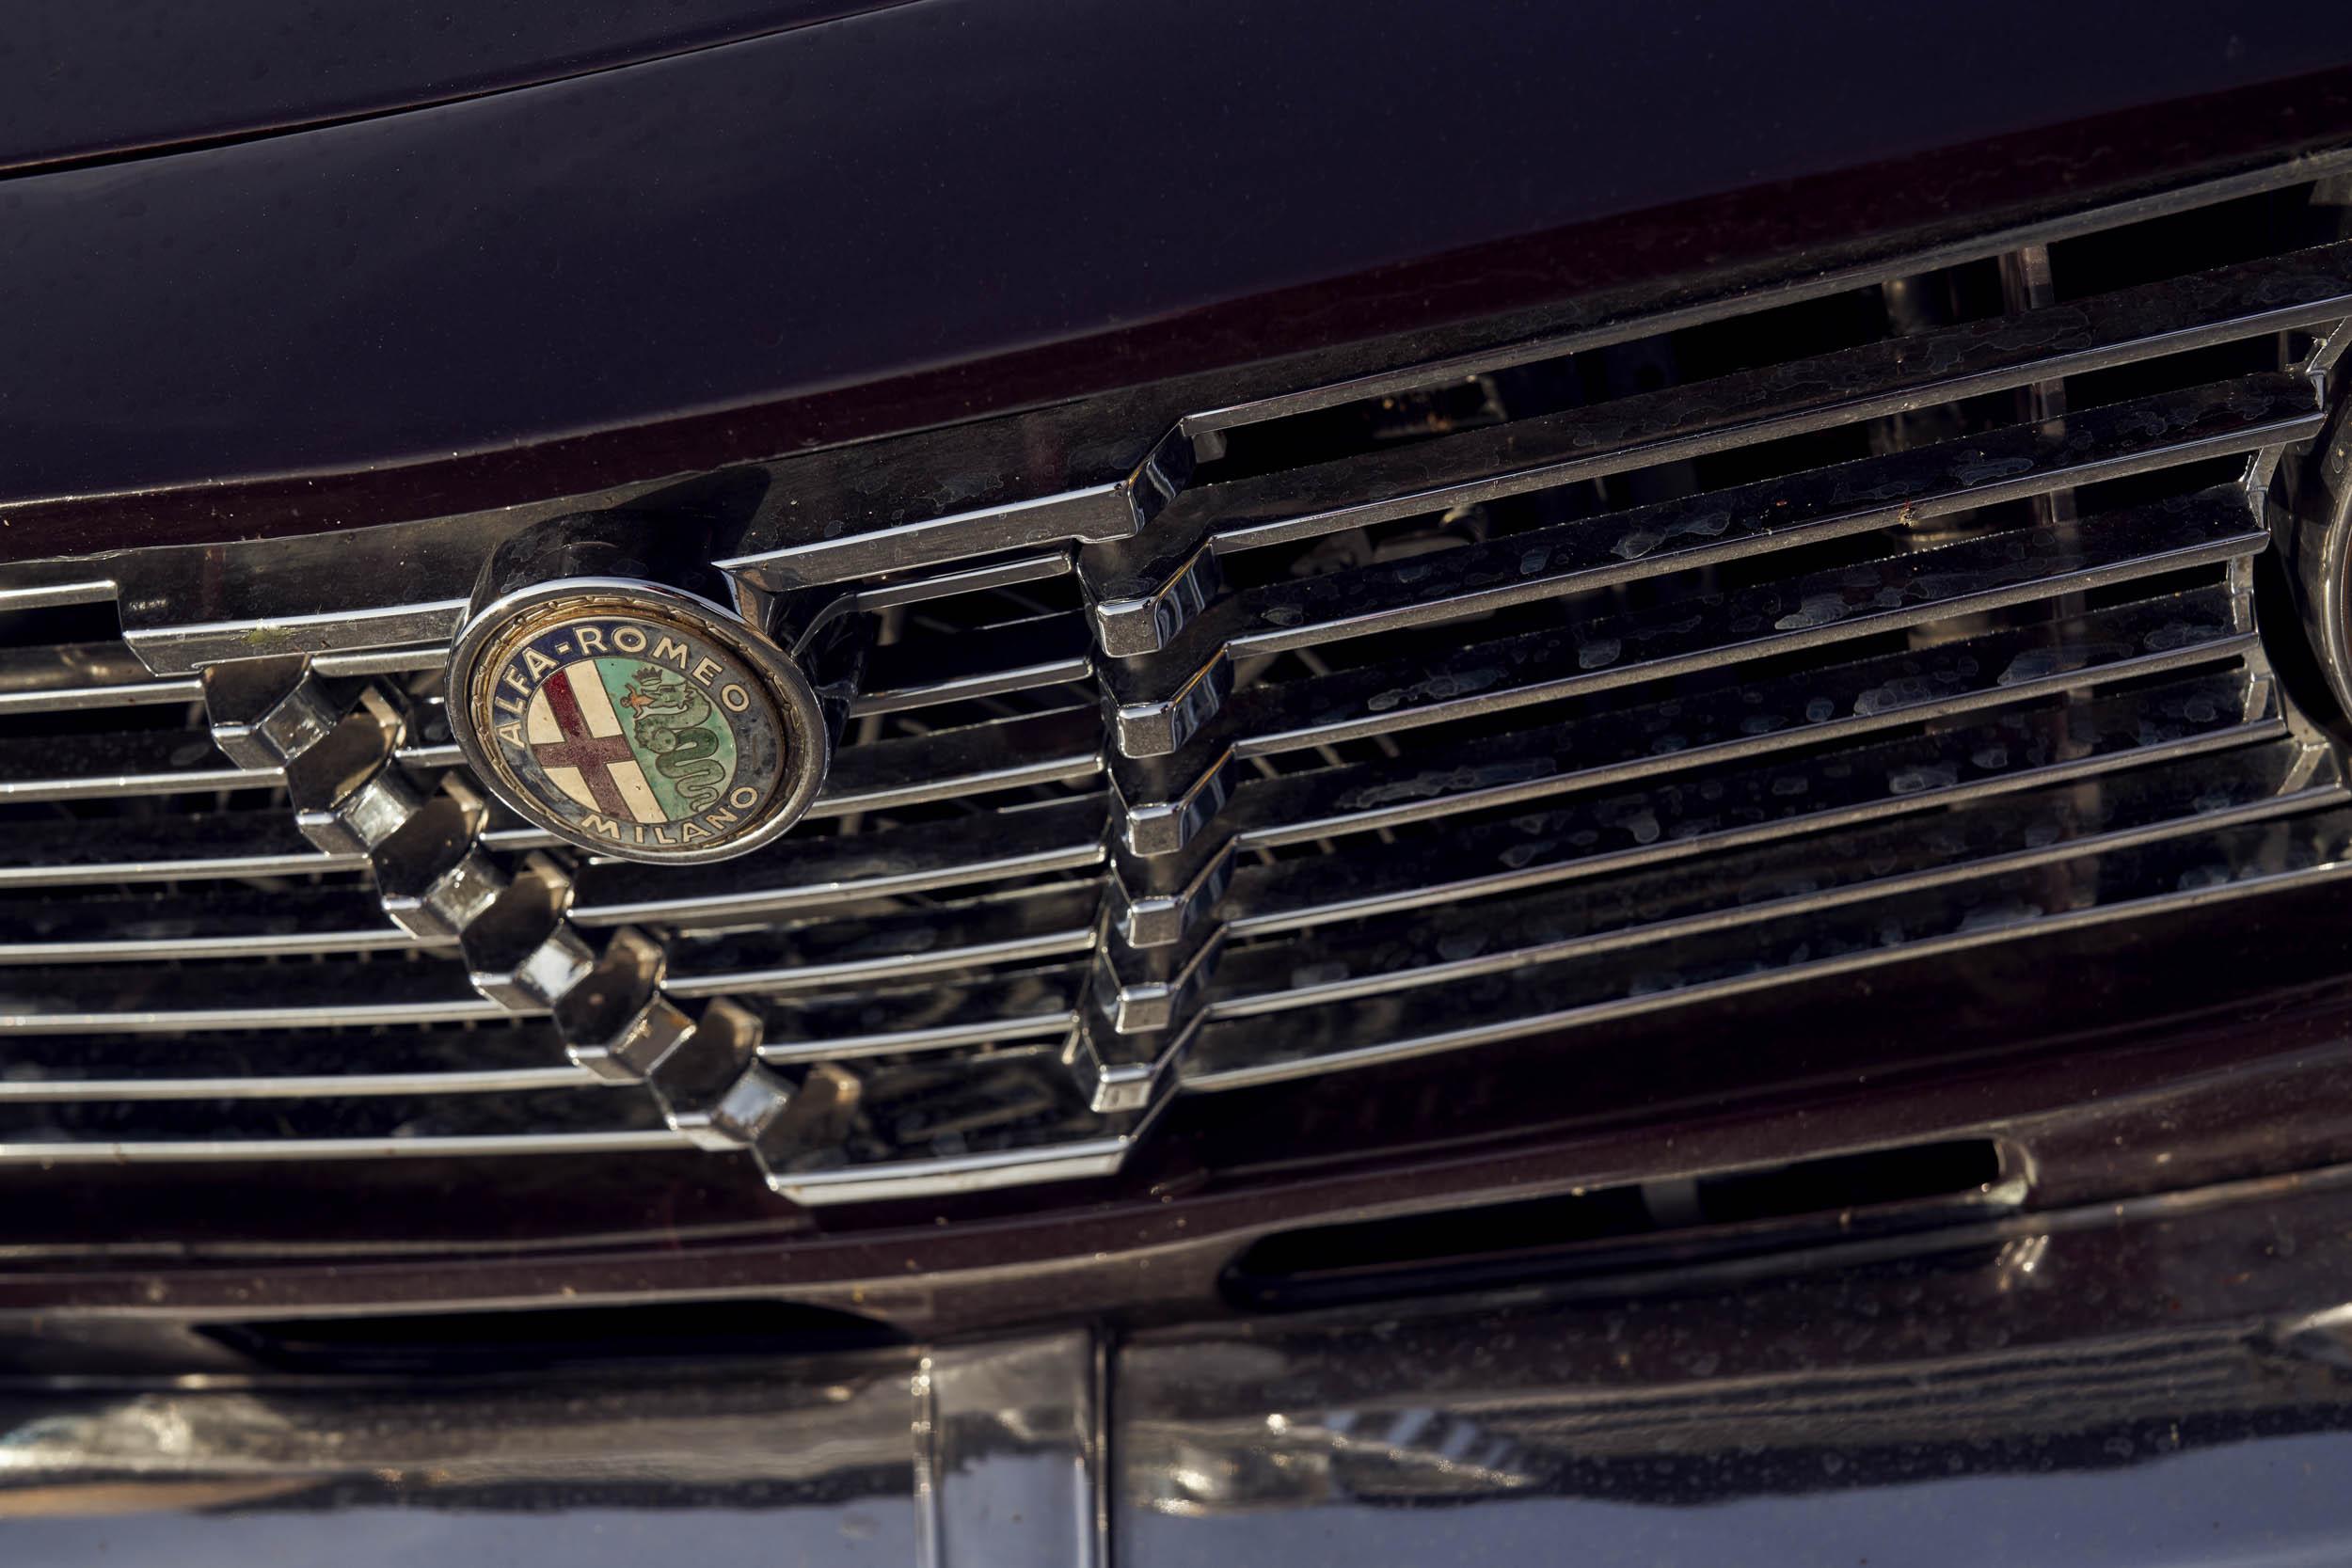 1974 Alfa Romeo GTV 2000 grille